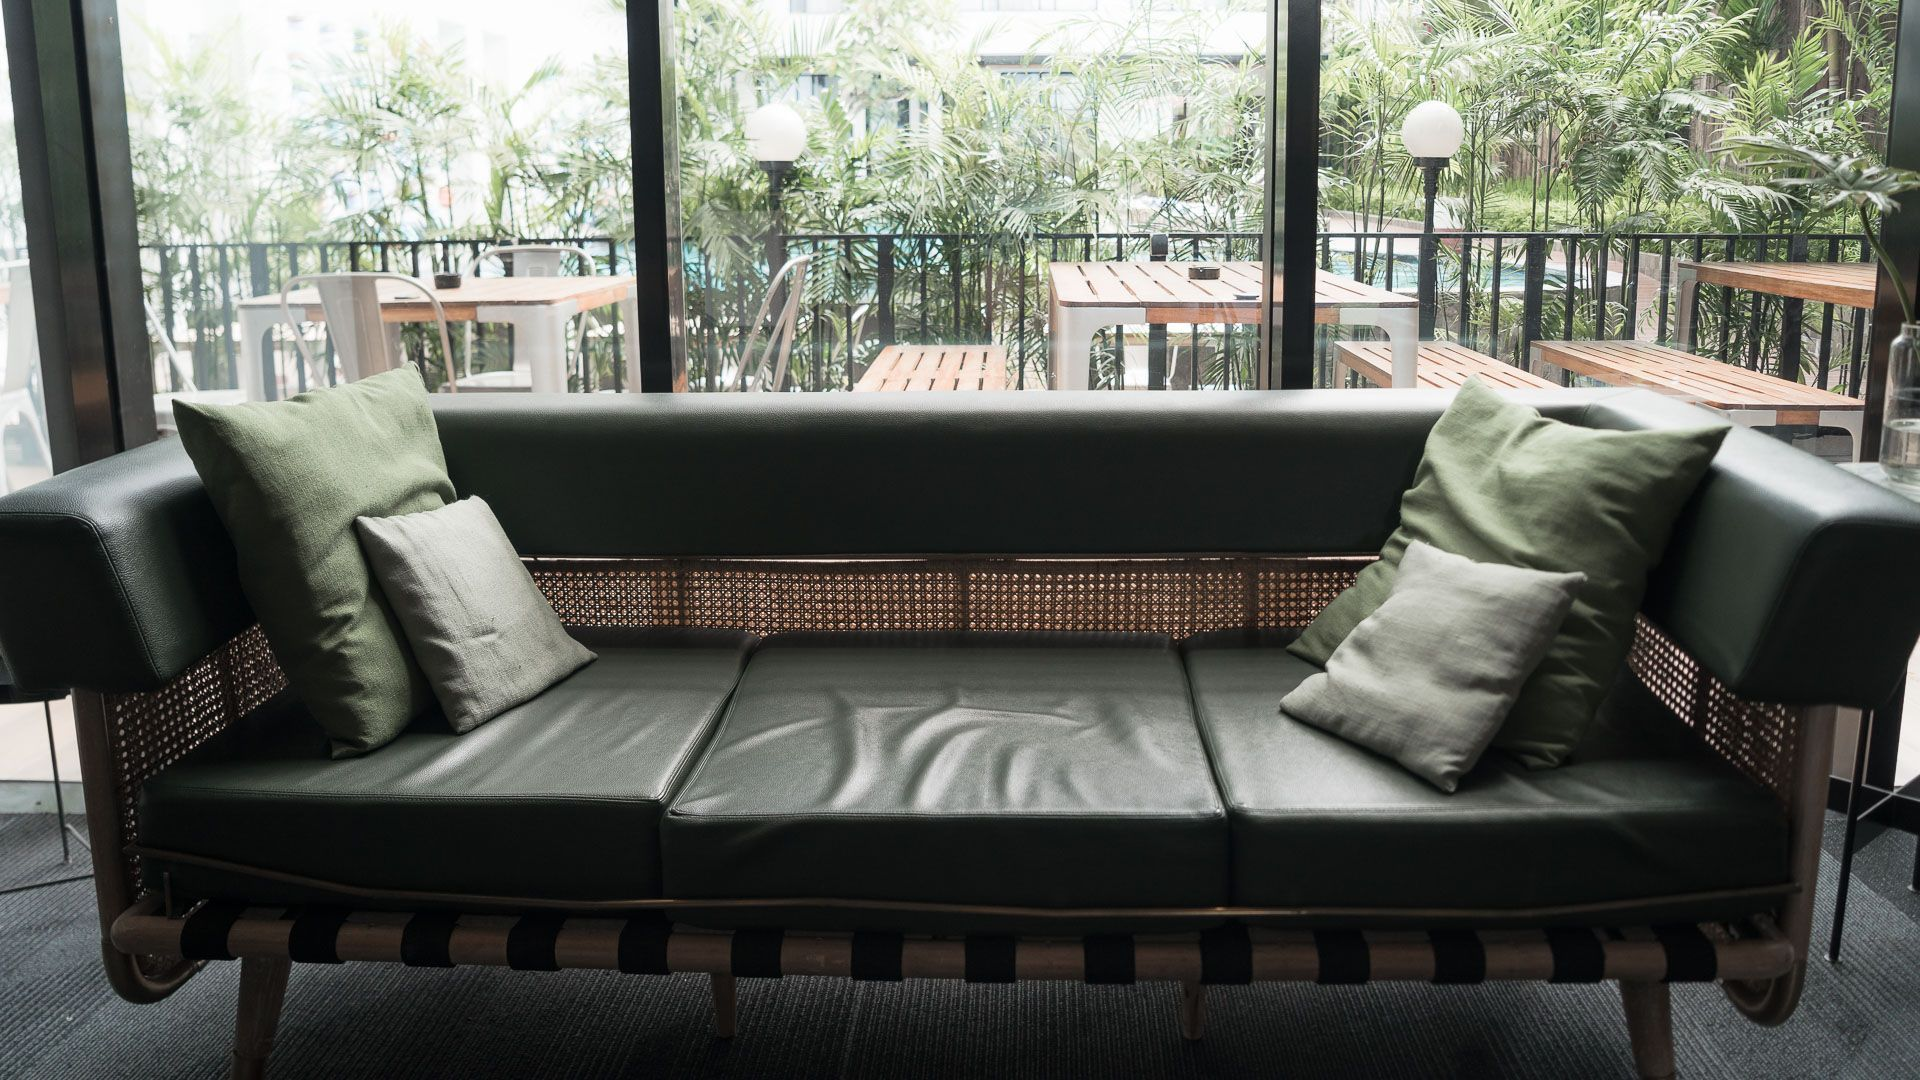 Lesvoyageuses-Indonesie-yogyacarta-gaia-cosmo-hotel-33